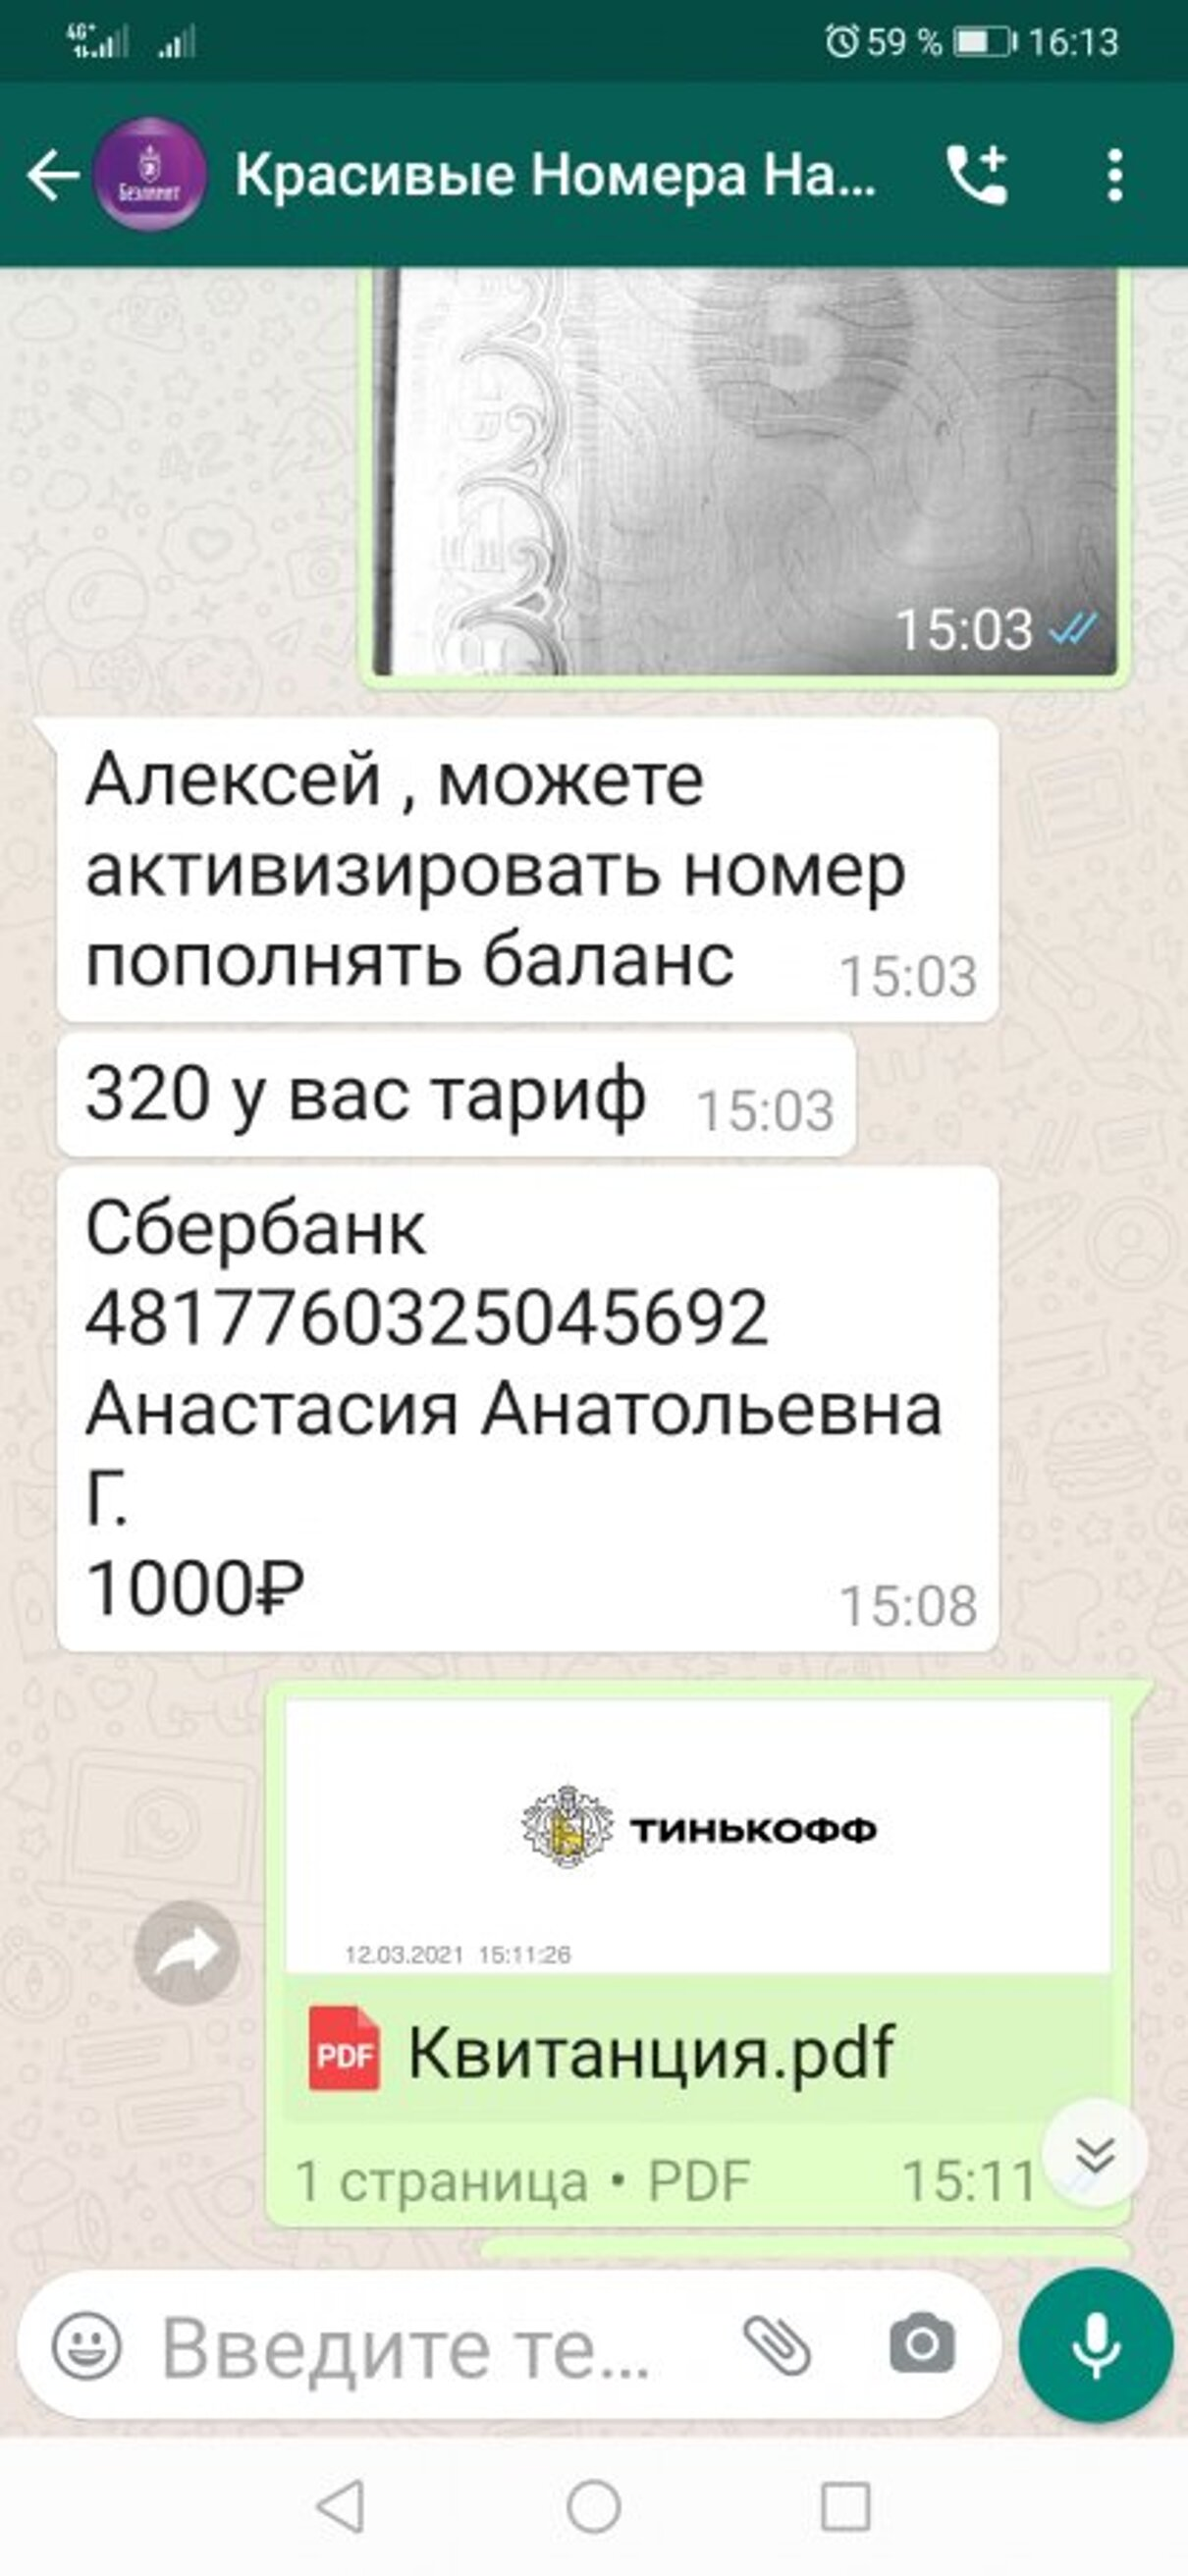 Жалоба-отзыв: Bezlimit.ru - Осторожно МОШЕННИКИ! bezlimit.ru.  Фото №2